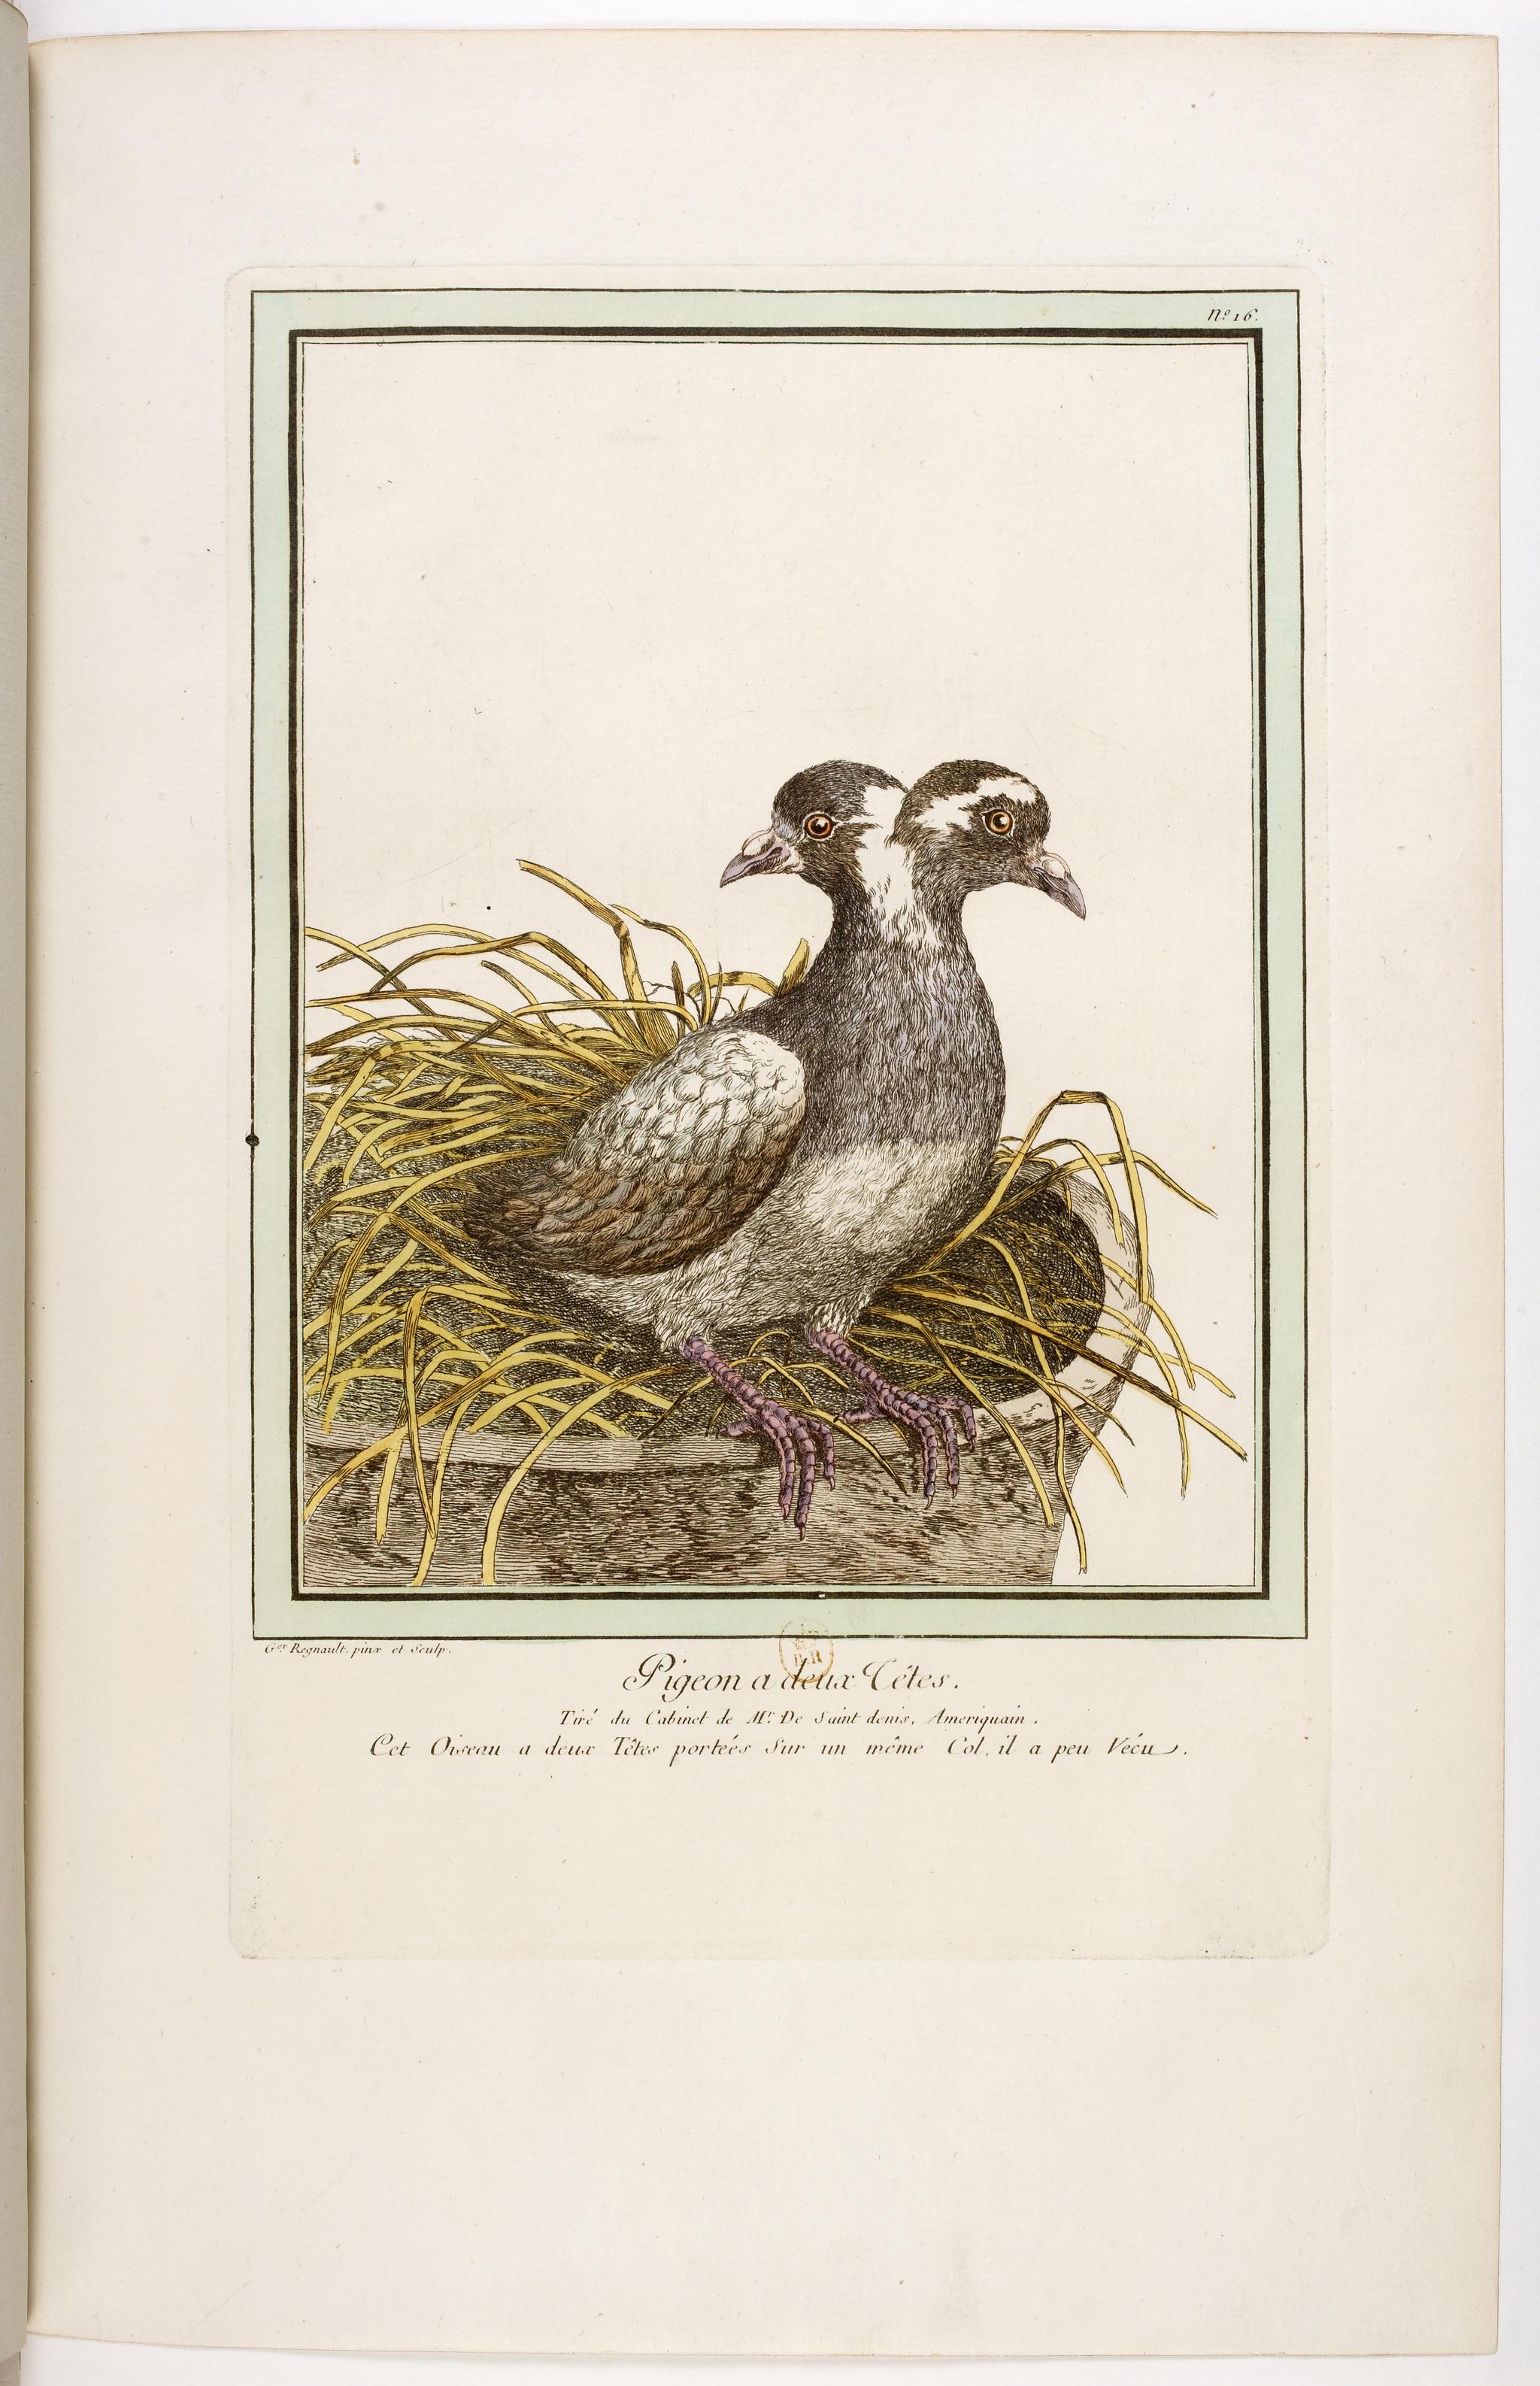 Secção 4 Pigeon a deux tetes.jpg